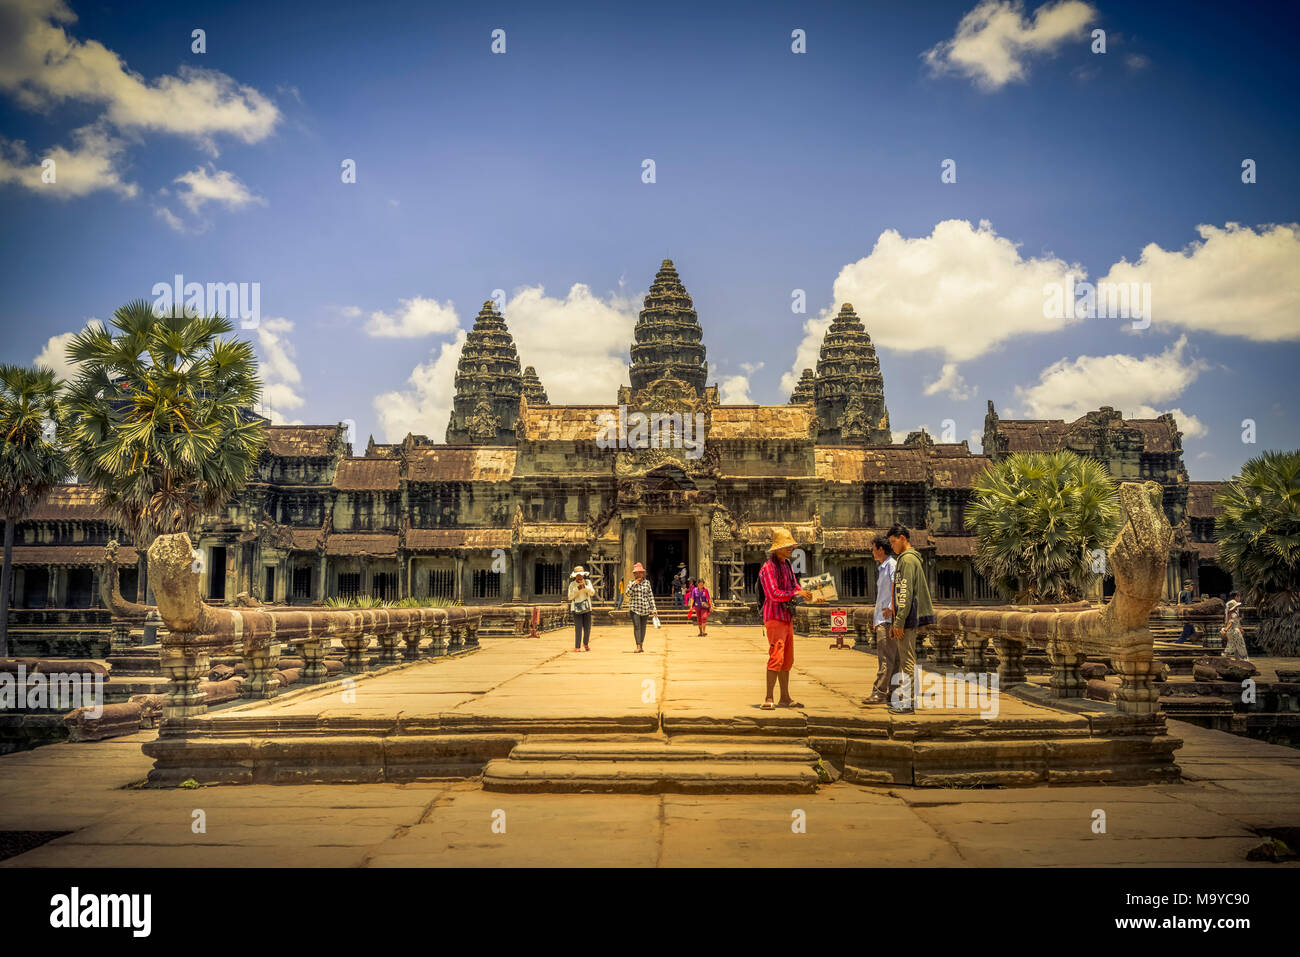 Asien, Kambodscha, Angkor Wat - Stock Image